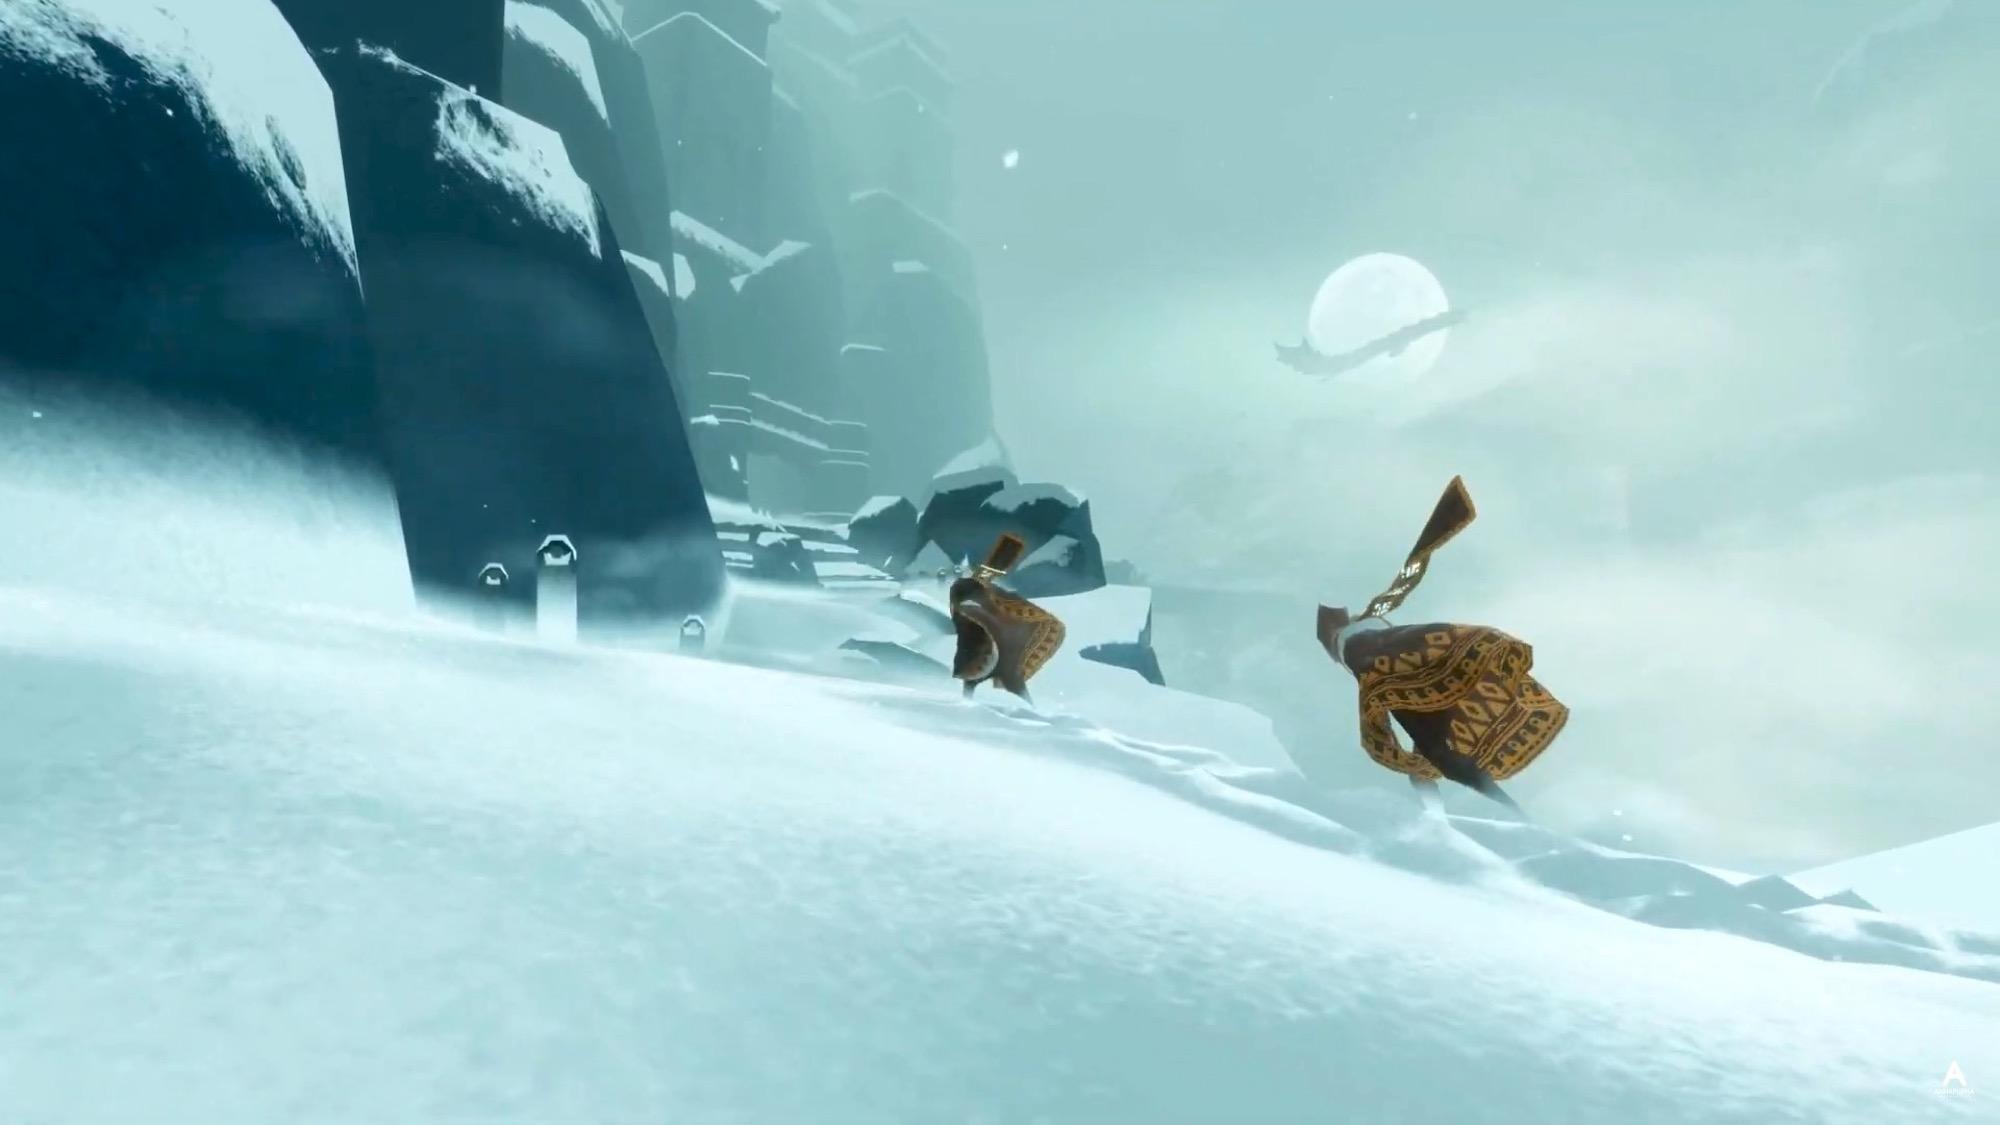 Capture écran jeu iOS Journey neige